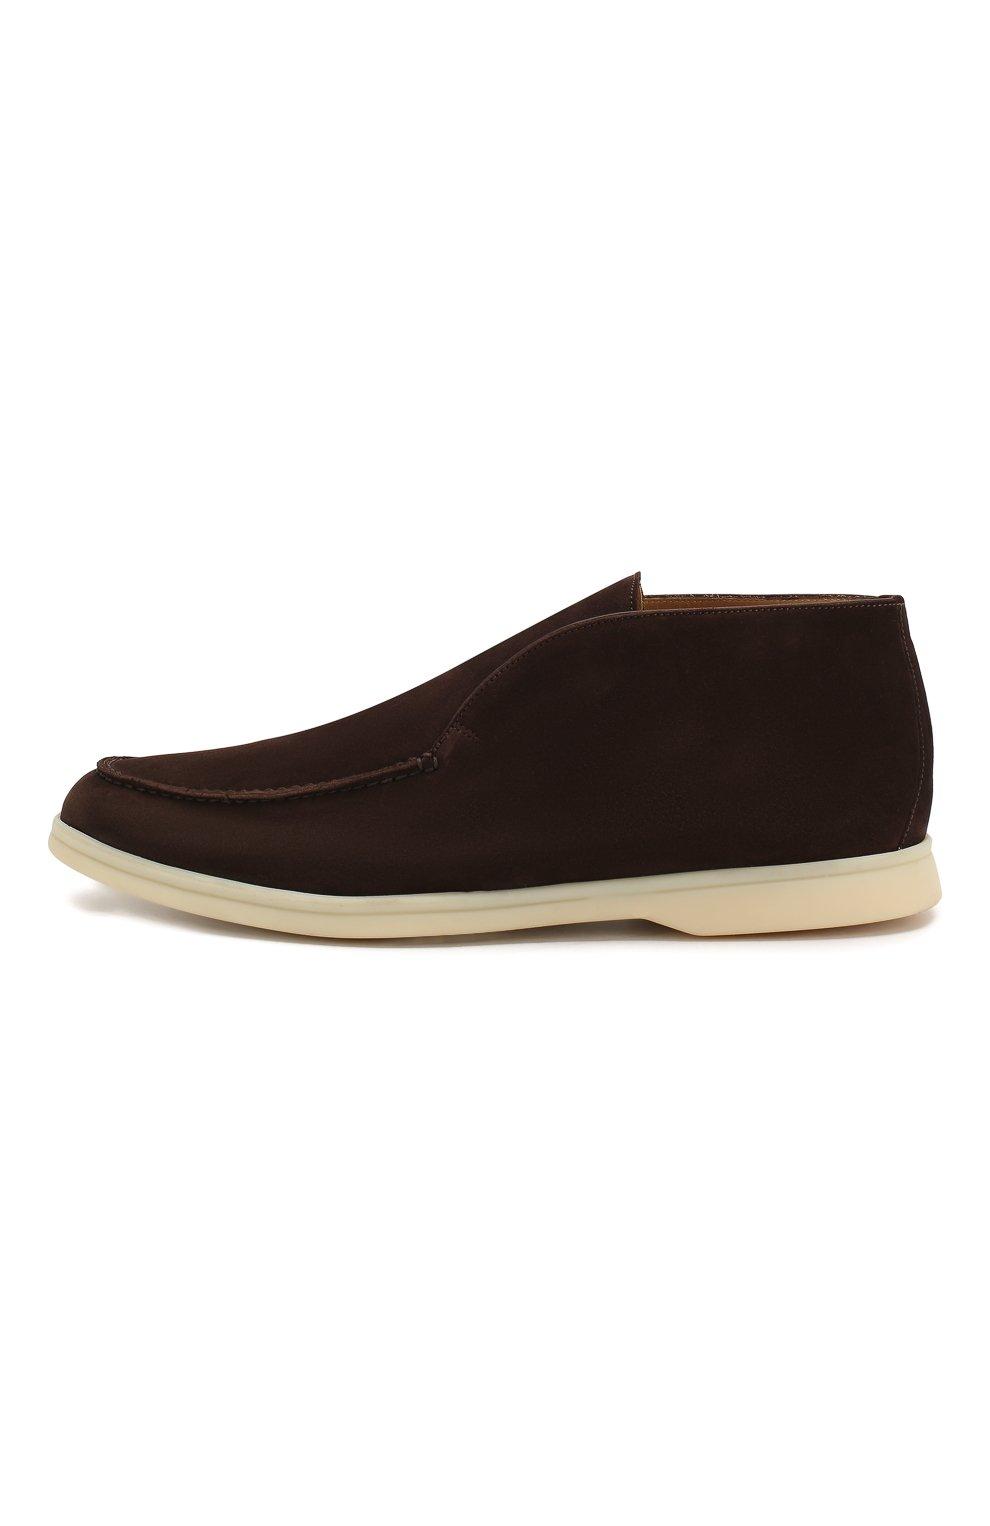 Мужские замшевые ботинки open walk LORO PIANA коричневого цвета, арт. FAB4368 | Фото 3